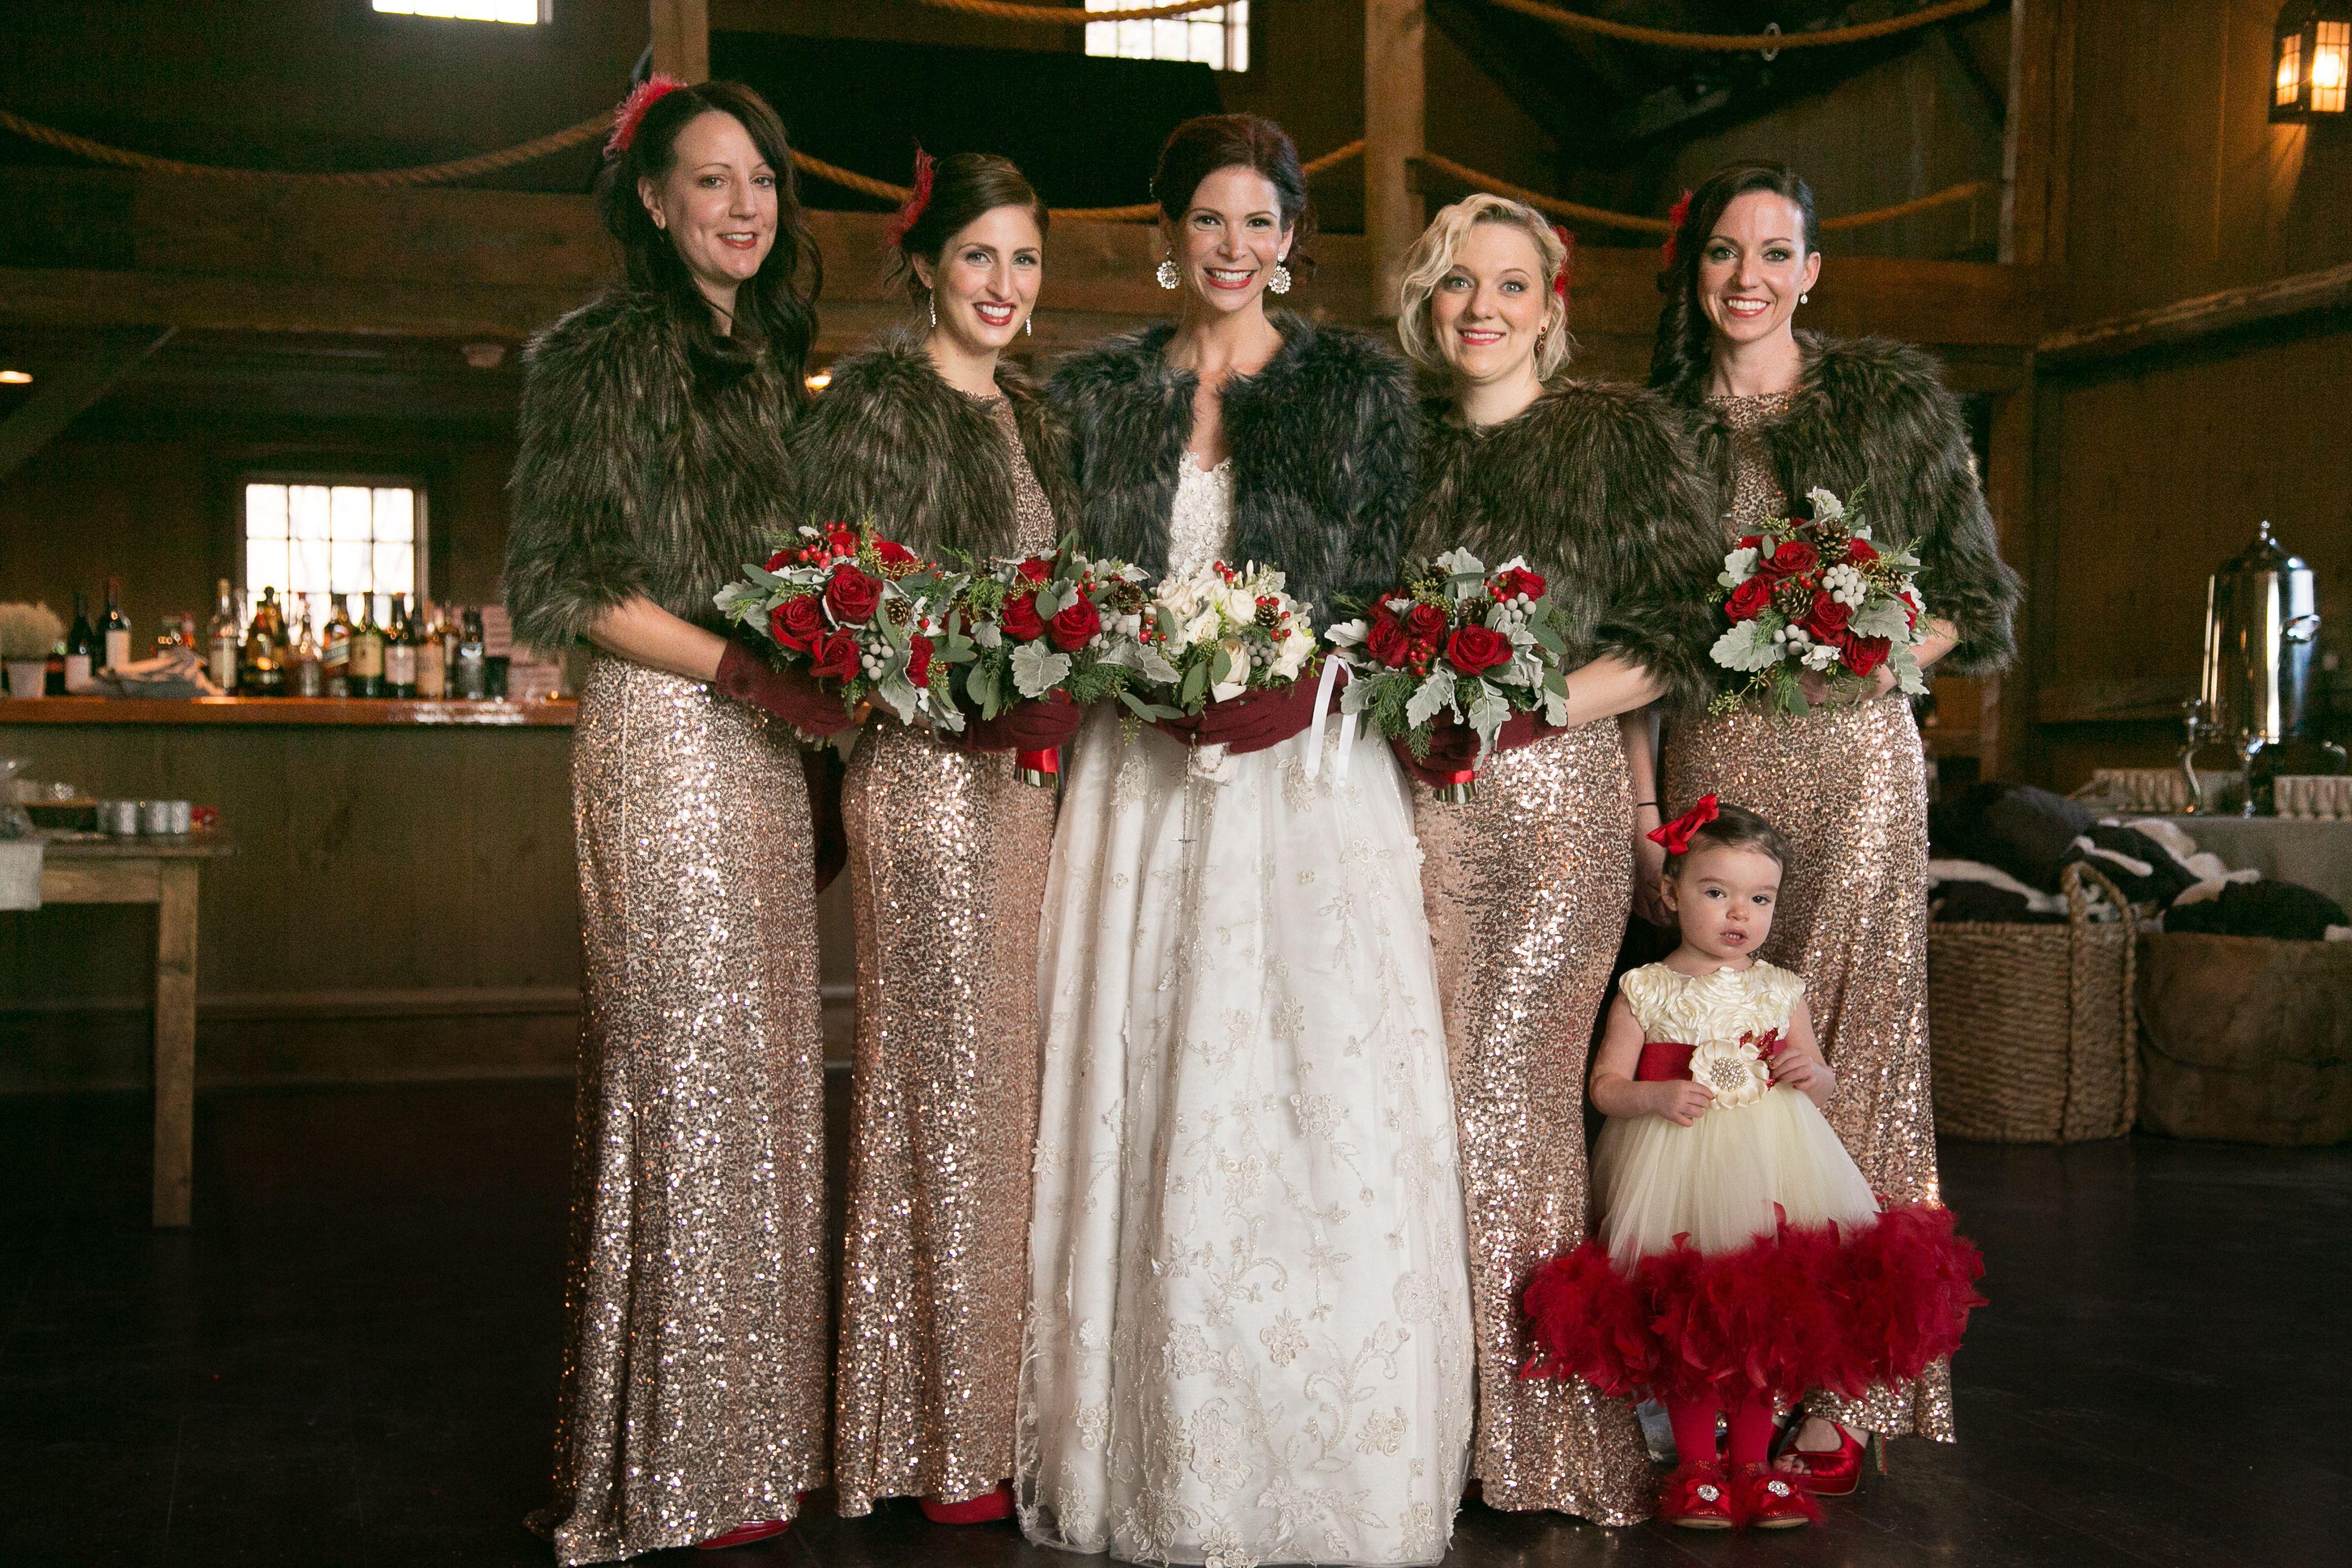 Sequin bridesmaids dresses 2013 wedding pinterest sequin sequin bridesmaids dresses ombrellifo Choice Image